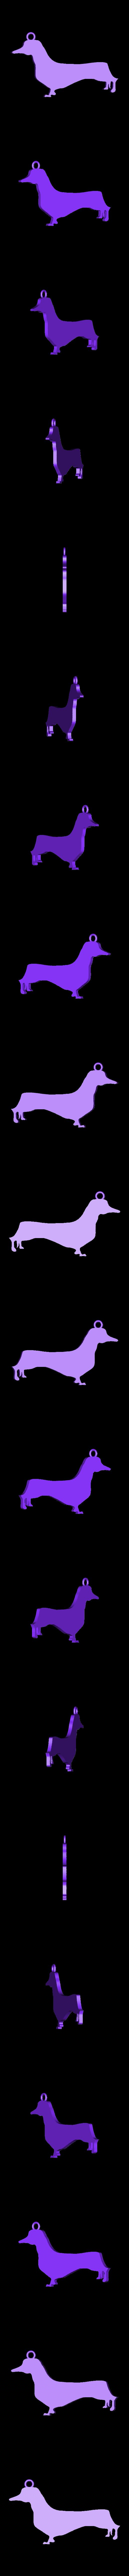 18.stl Download STL file Dogs • 3D printing object, GENNADI3313